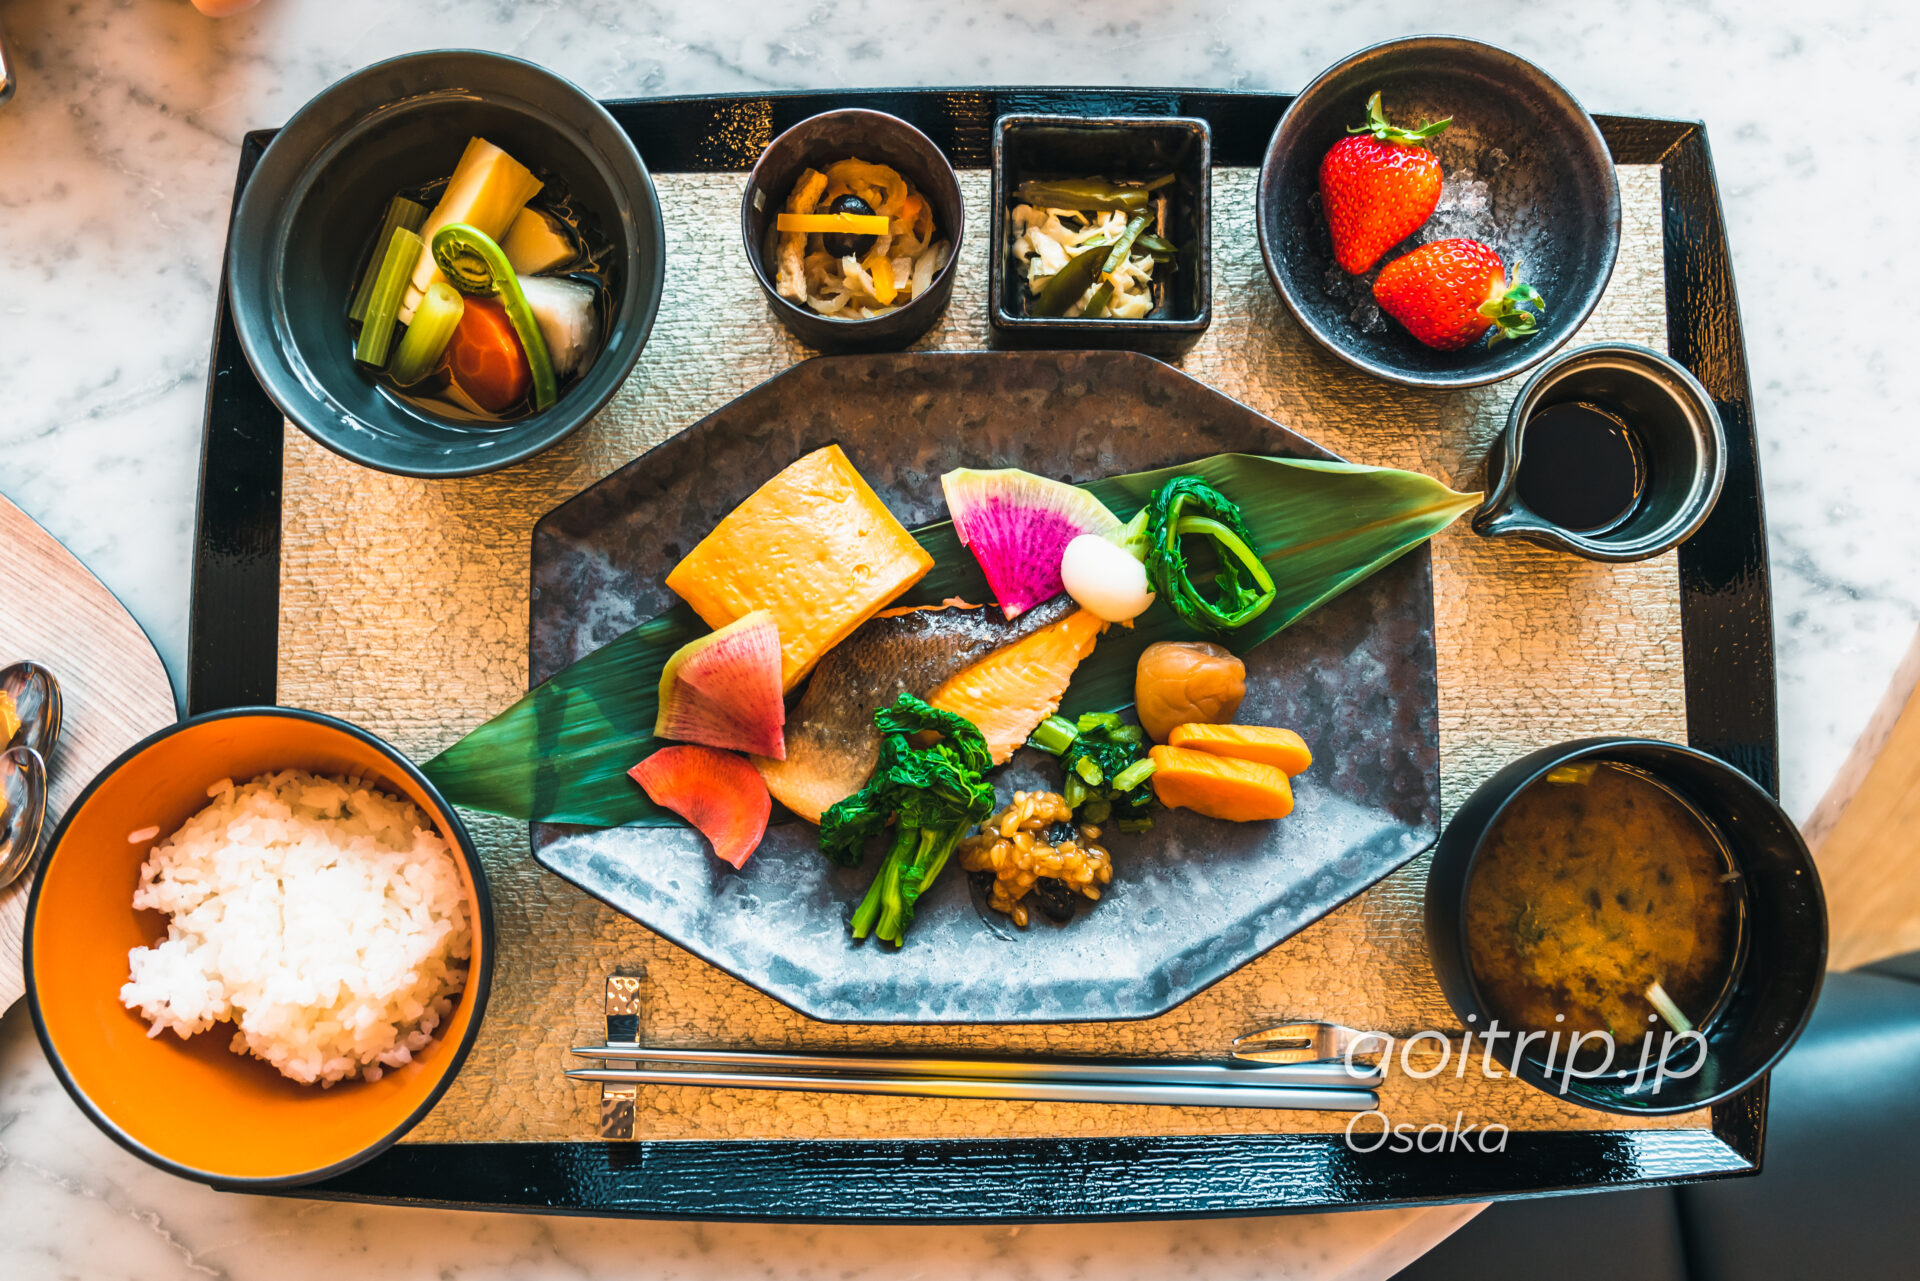 W大阪の朝食 Oh.lala…(オーララ)の和定食 日本の朝ごはん